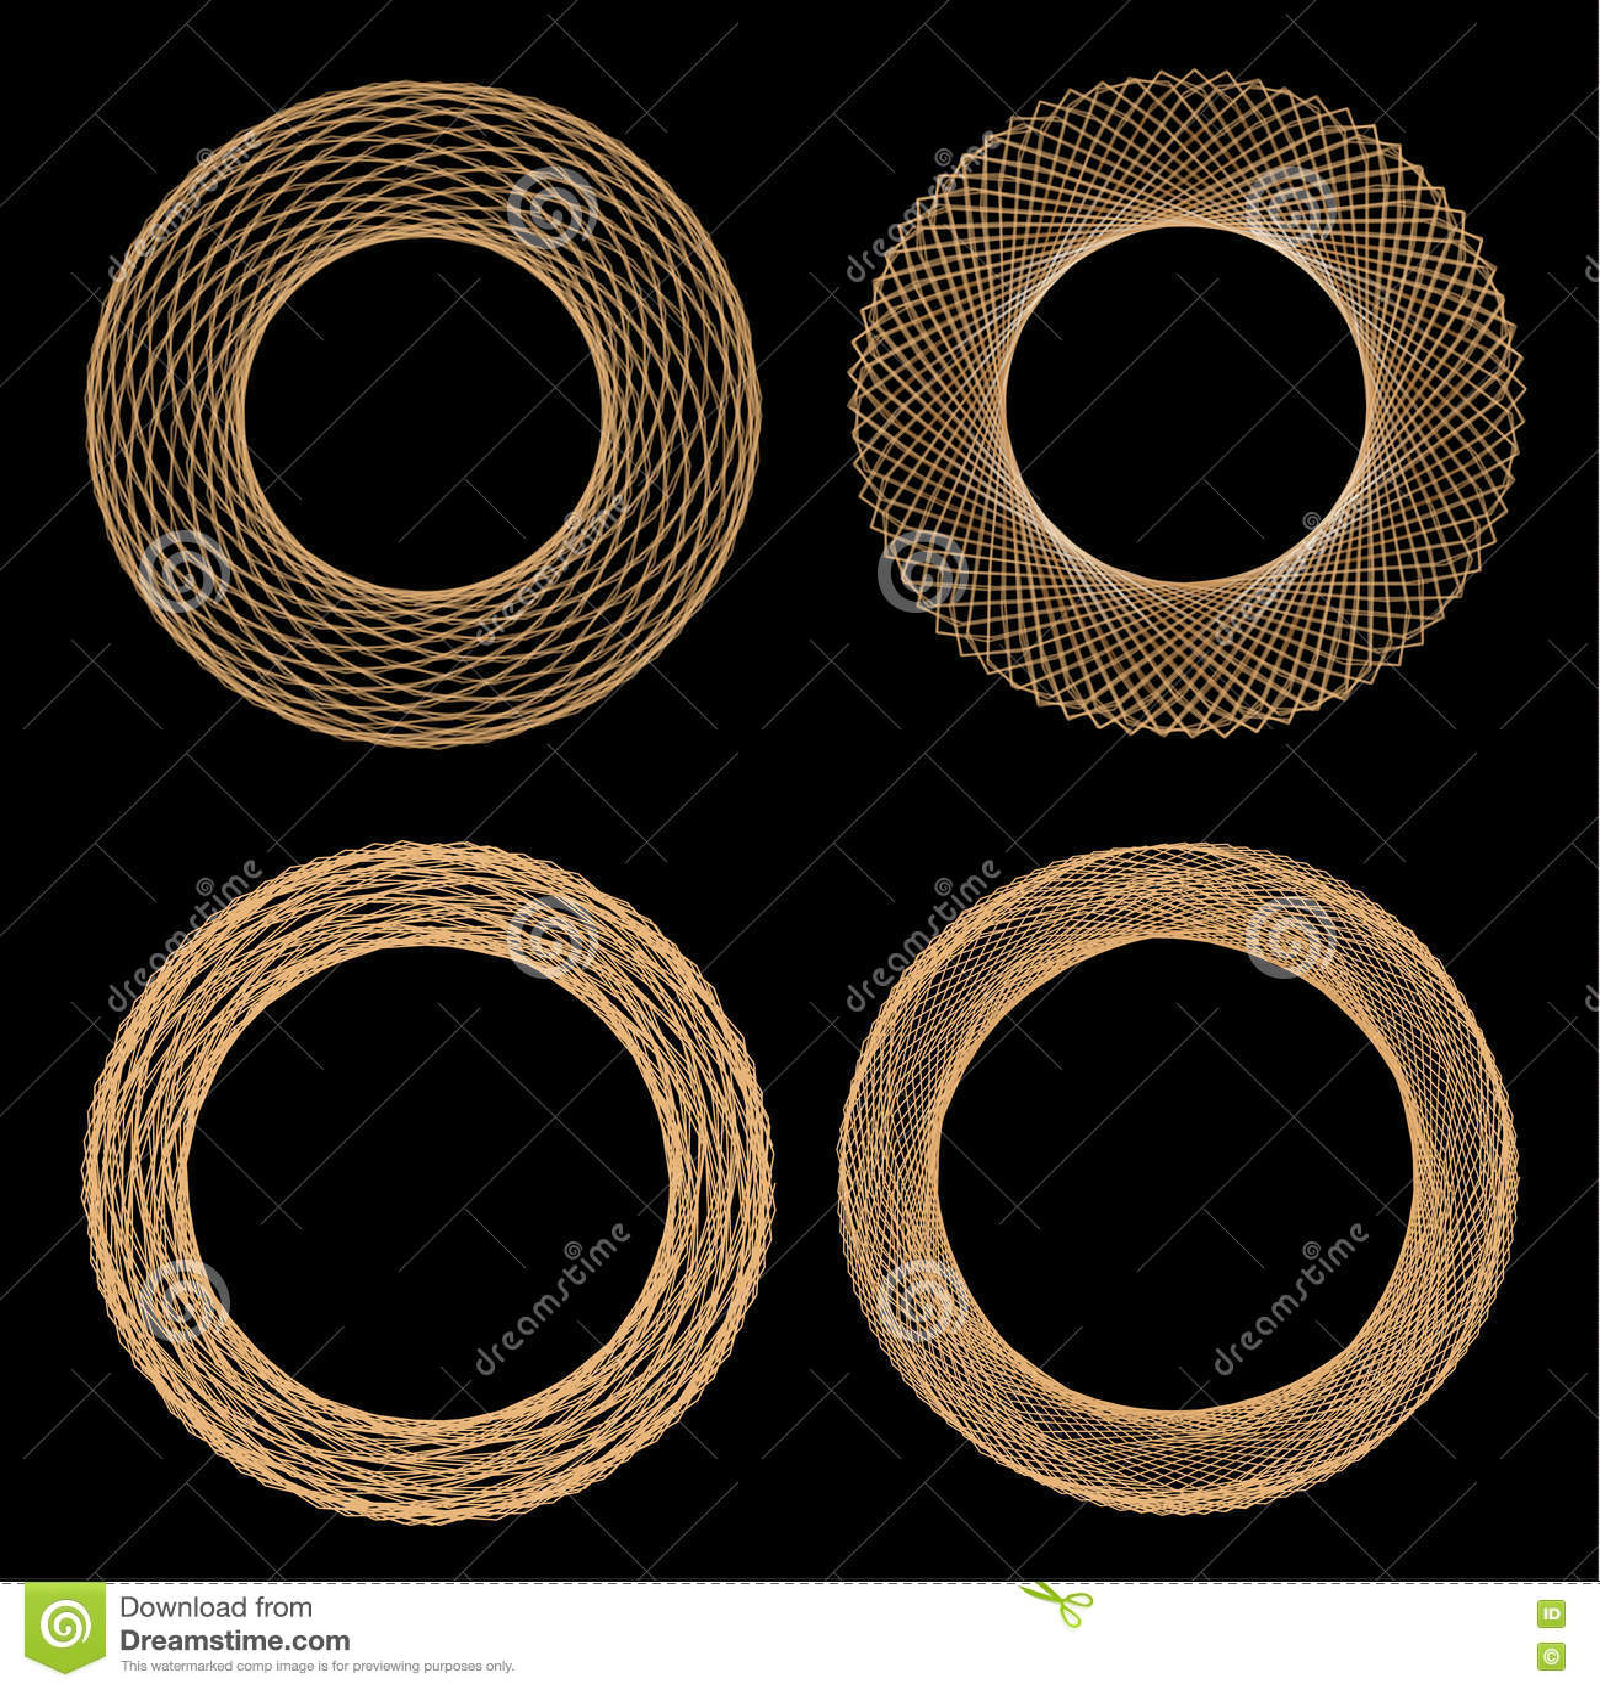 Set of mandalas. The ornament, a circular geometric pattern, spirogram.